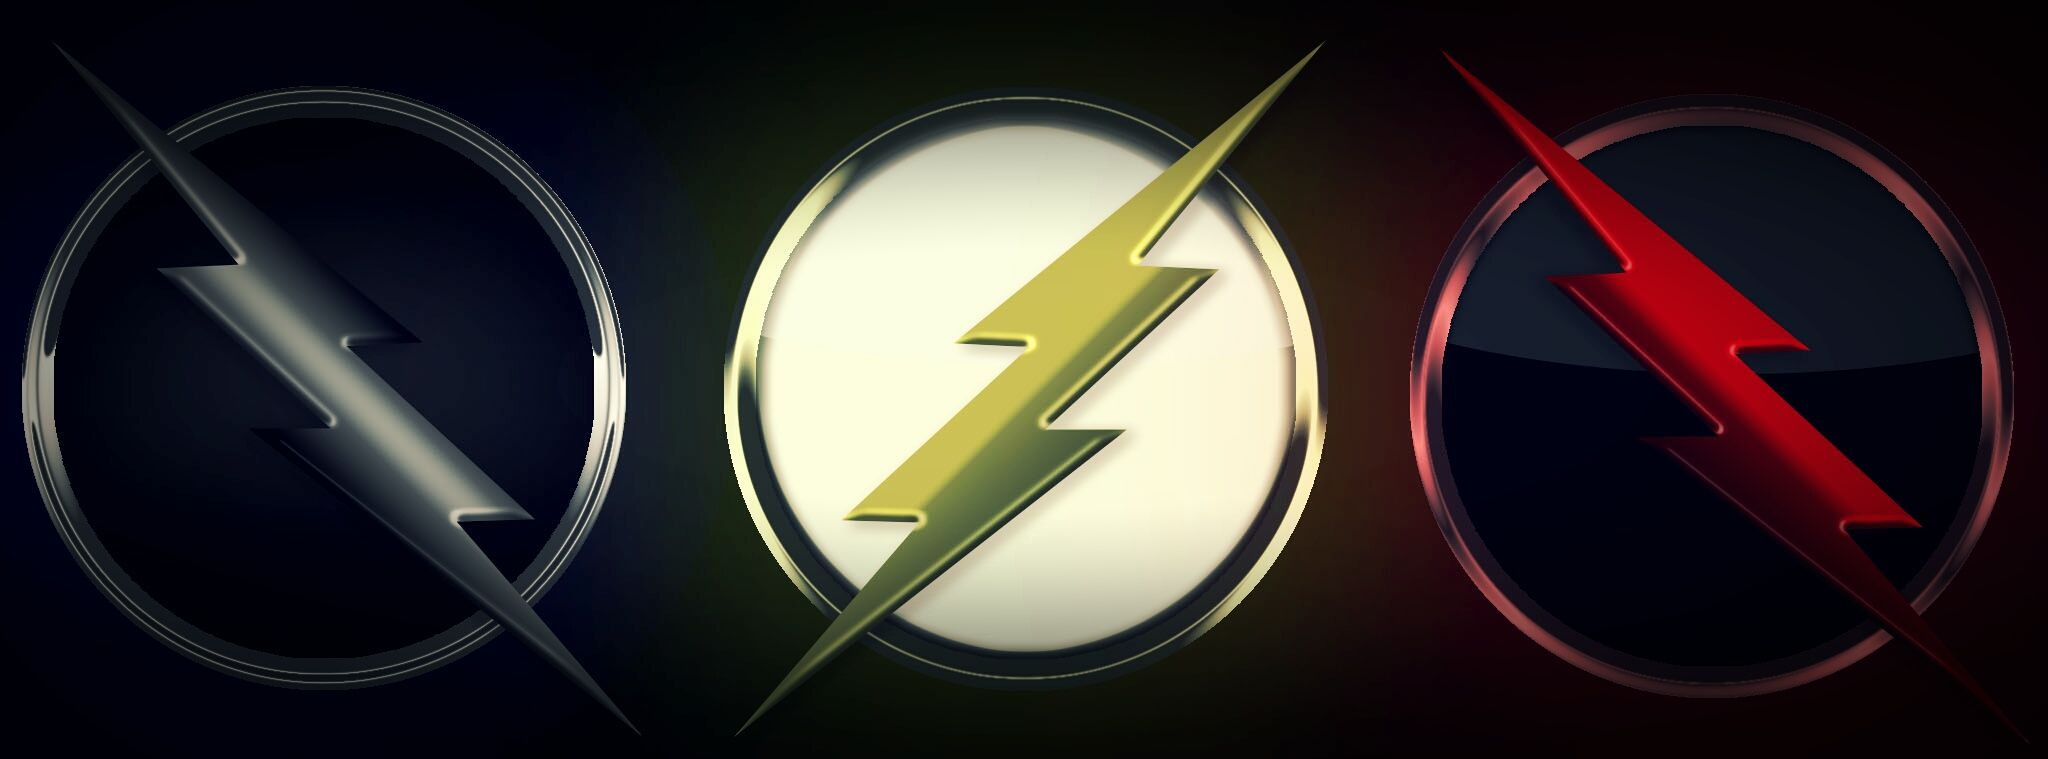 speedsters logo flash reverse flash and zoom good stuff